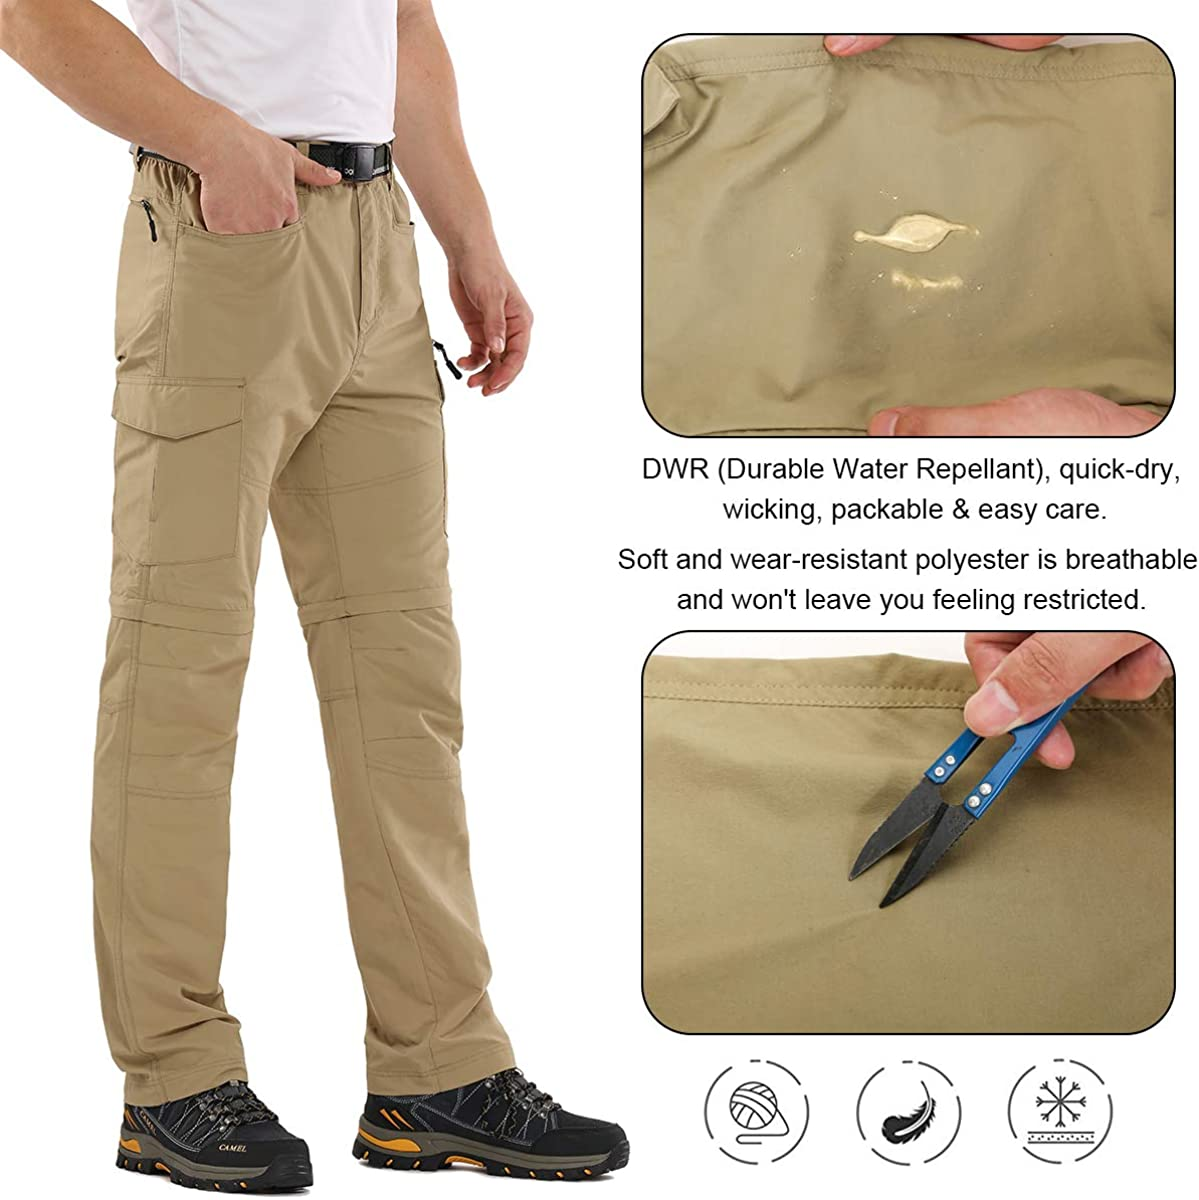 6045 Black 36 Mens Hiking Pants Zip Off Convertible Quick Dry Lightweight Outdoor Fishing Travel Safari Pants